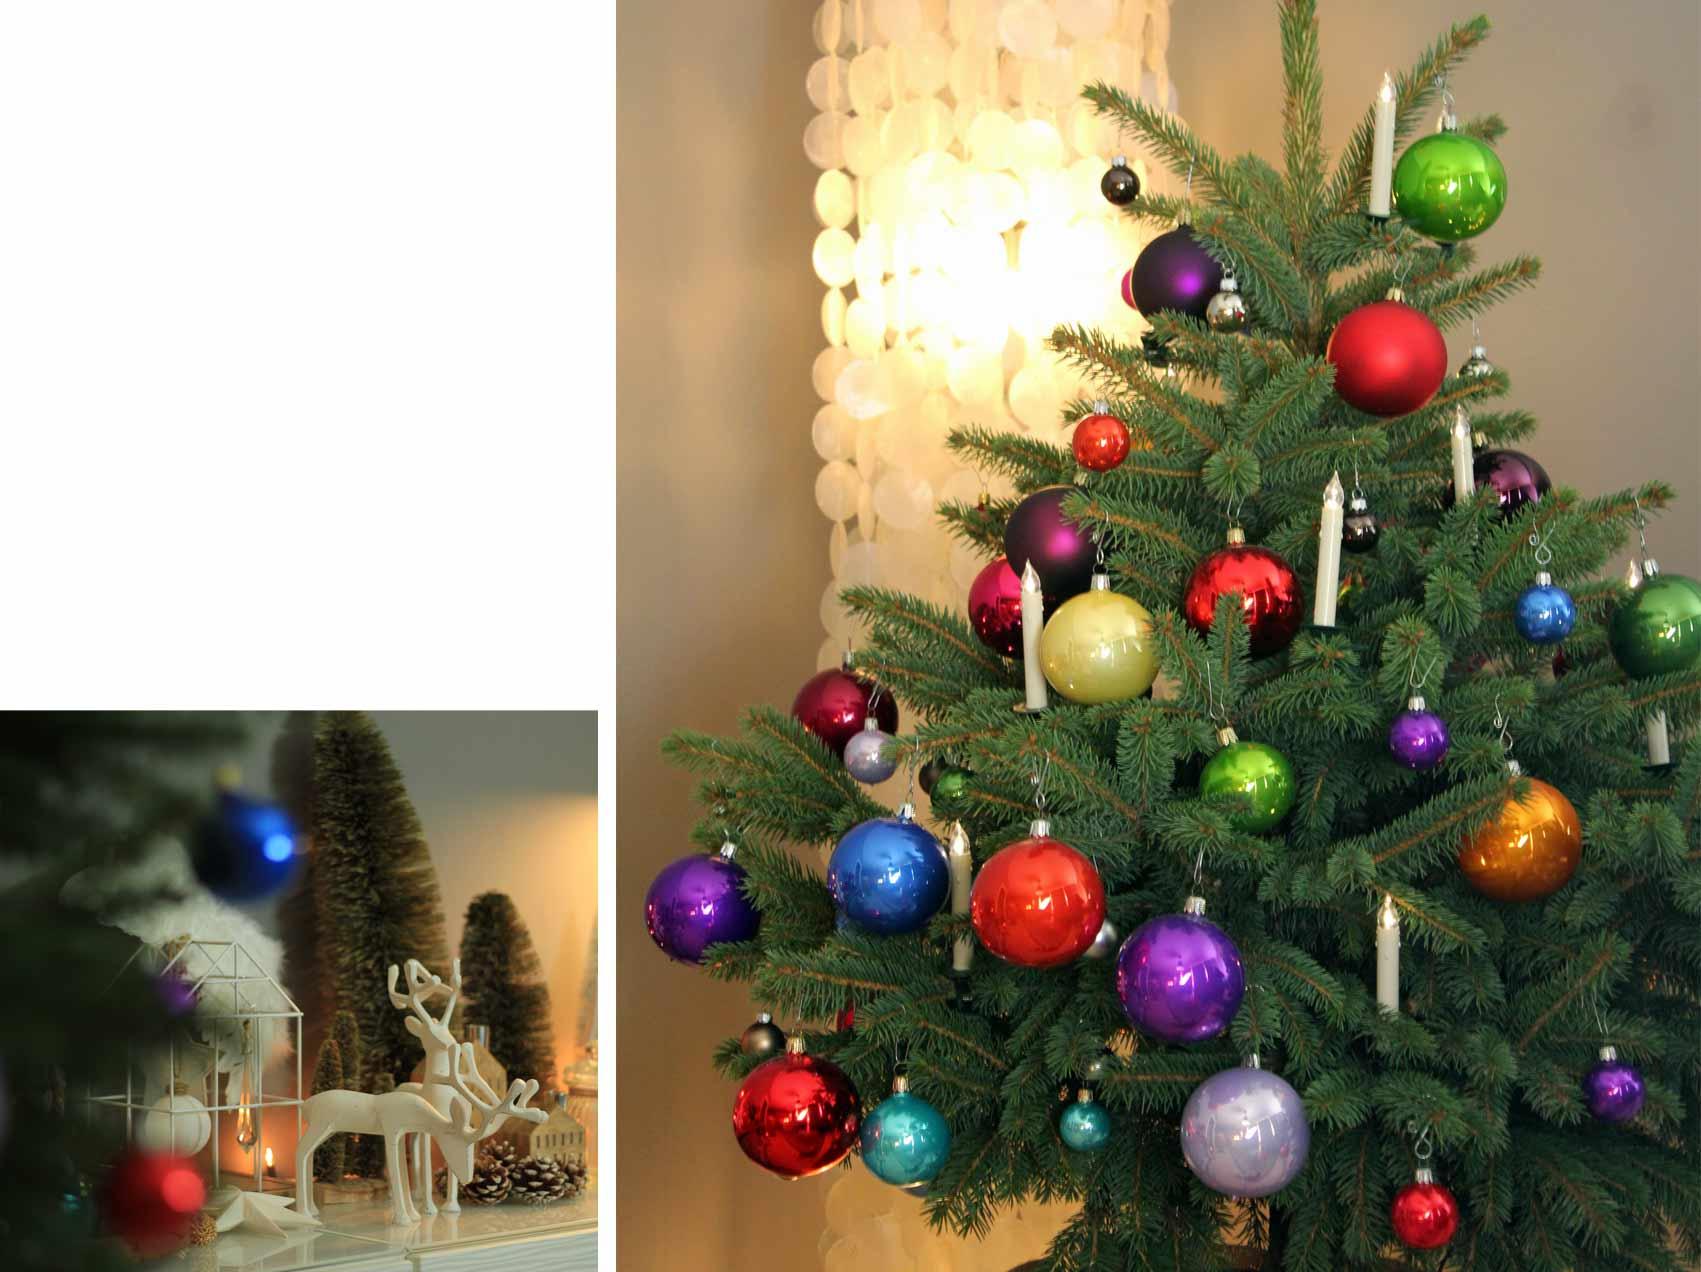 deko weihnachtsbaum bunt weihnachten mokowo komplett mokowo. Black Bedroom Furniture Sets. Home Design Ideas